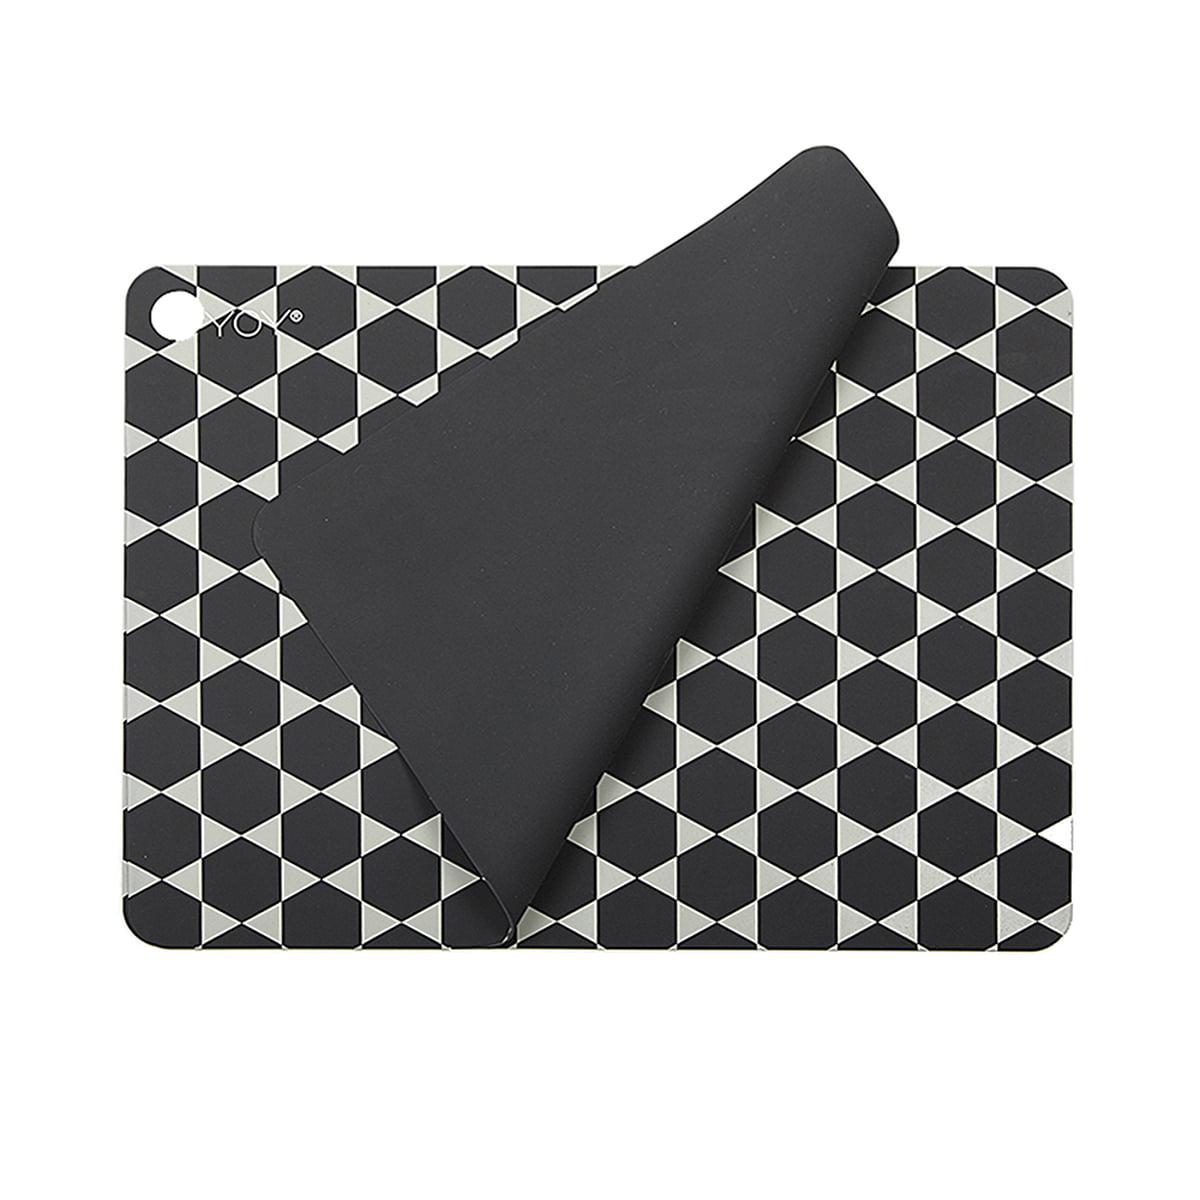 OYOY - Tischsets Hexagon, dunkelgrau (2er-Set)